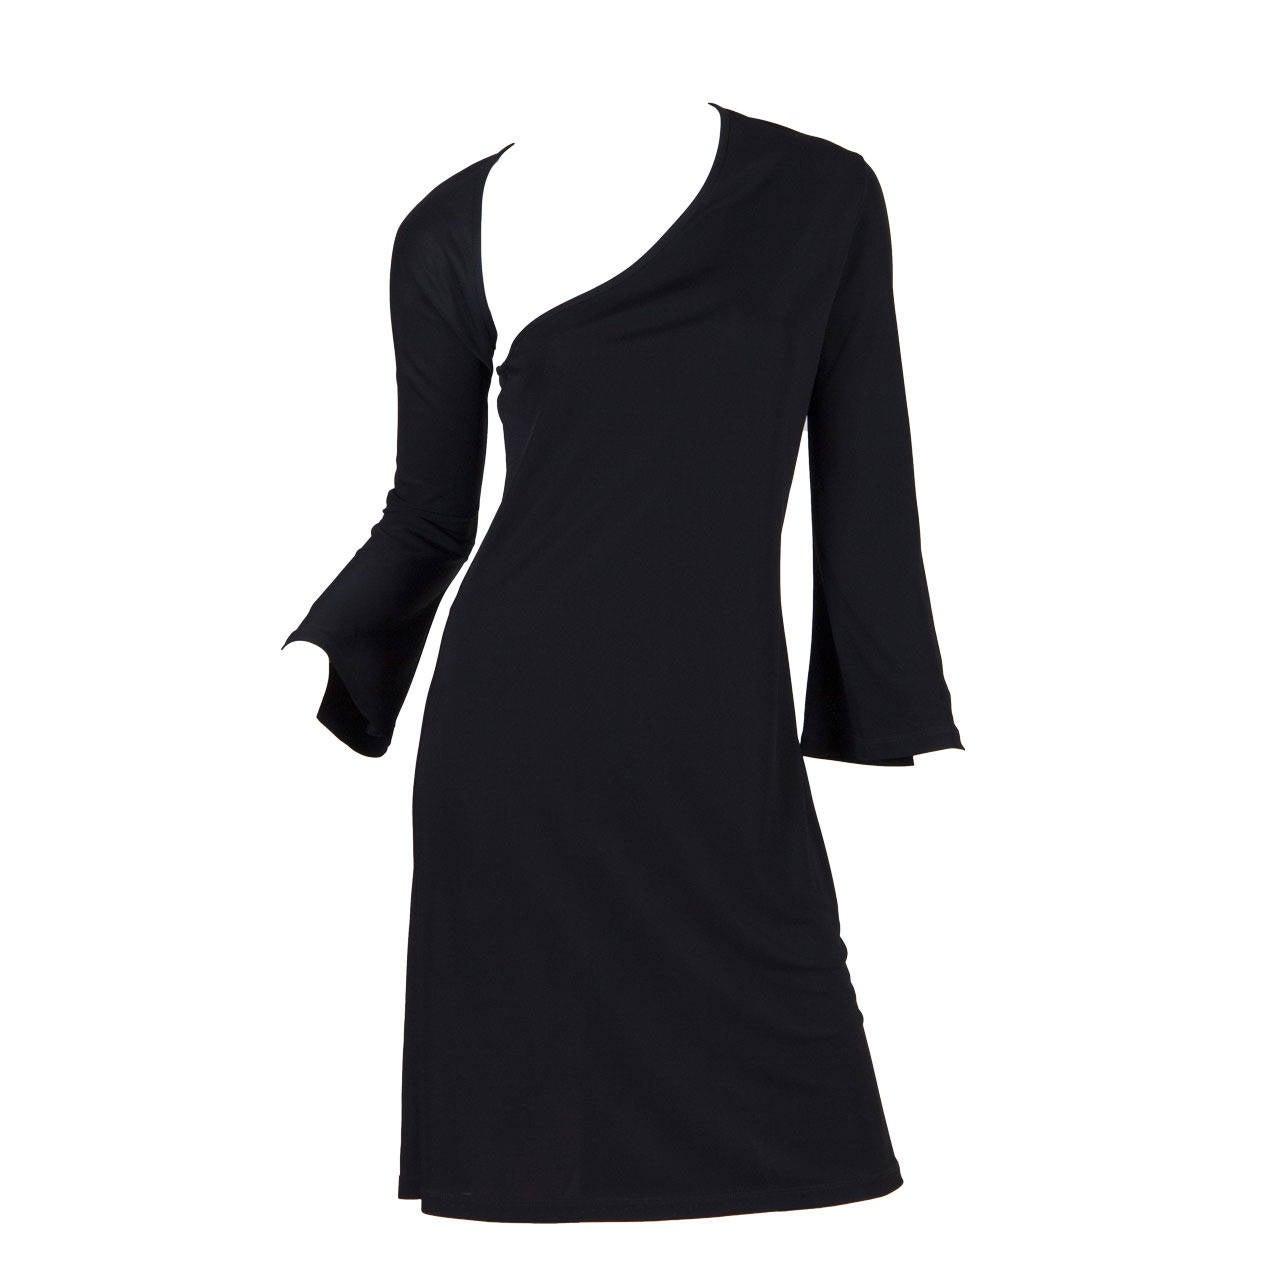 Jean Paul Gaultier Wraparound Sleeve Dress